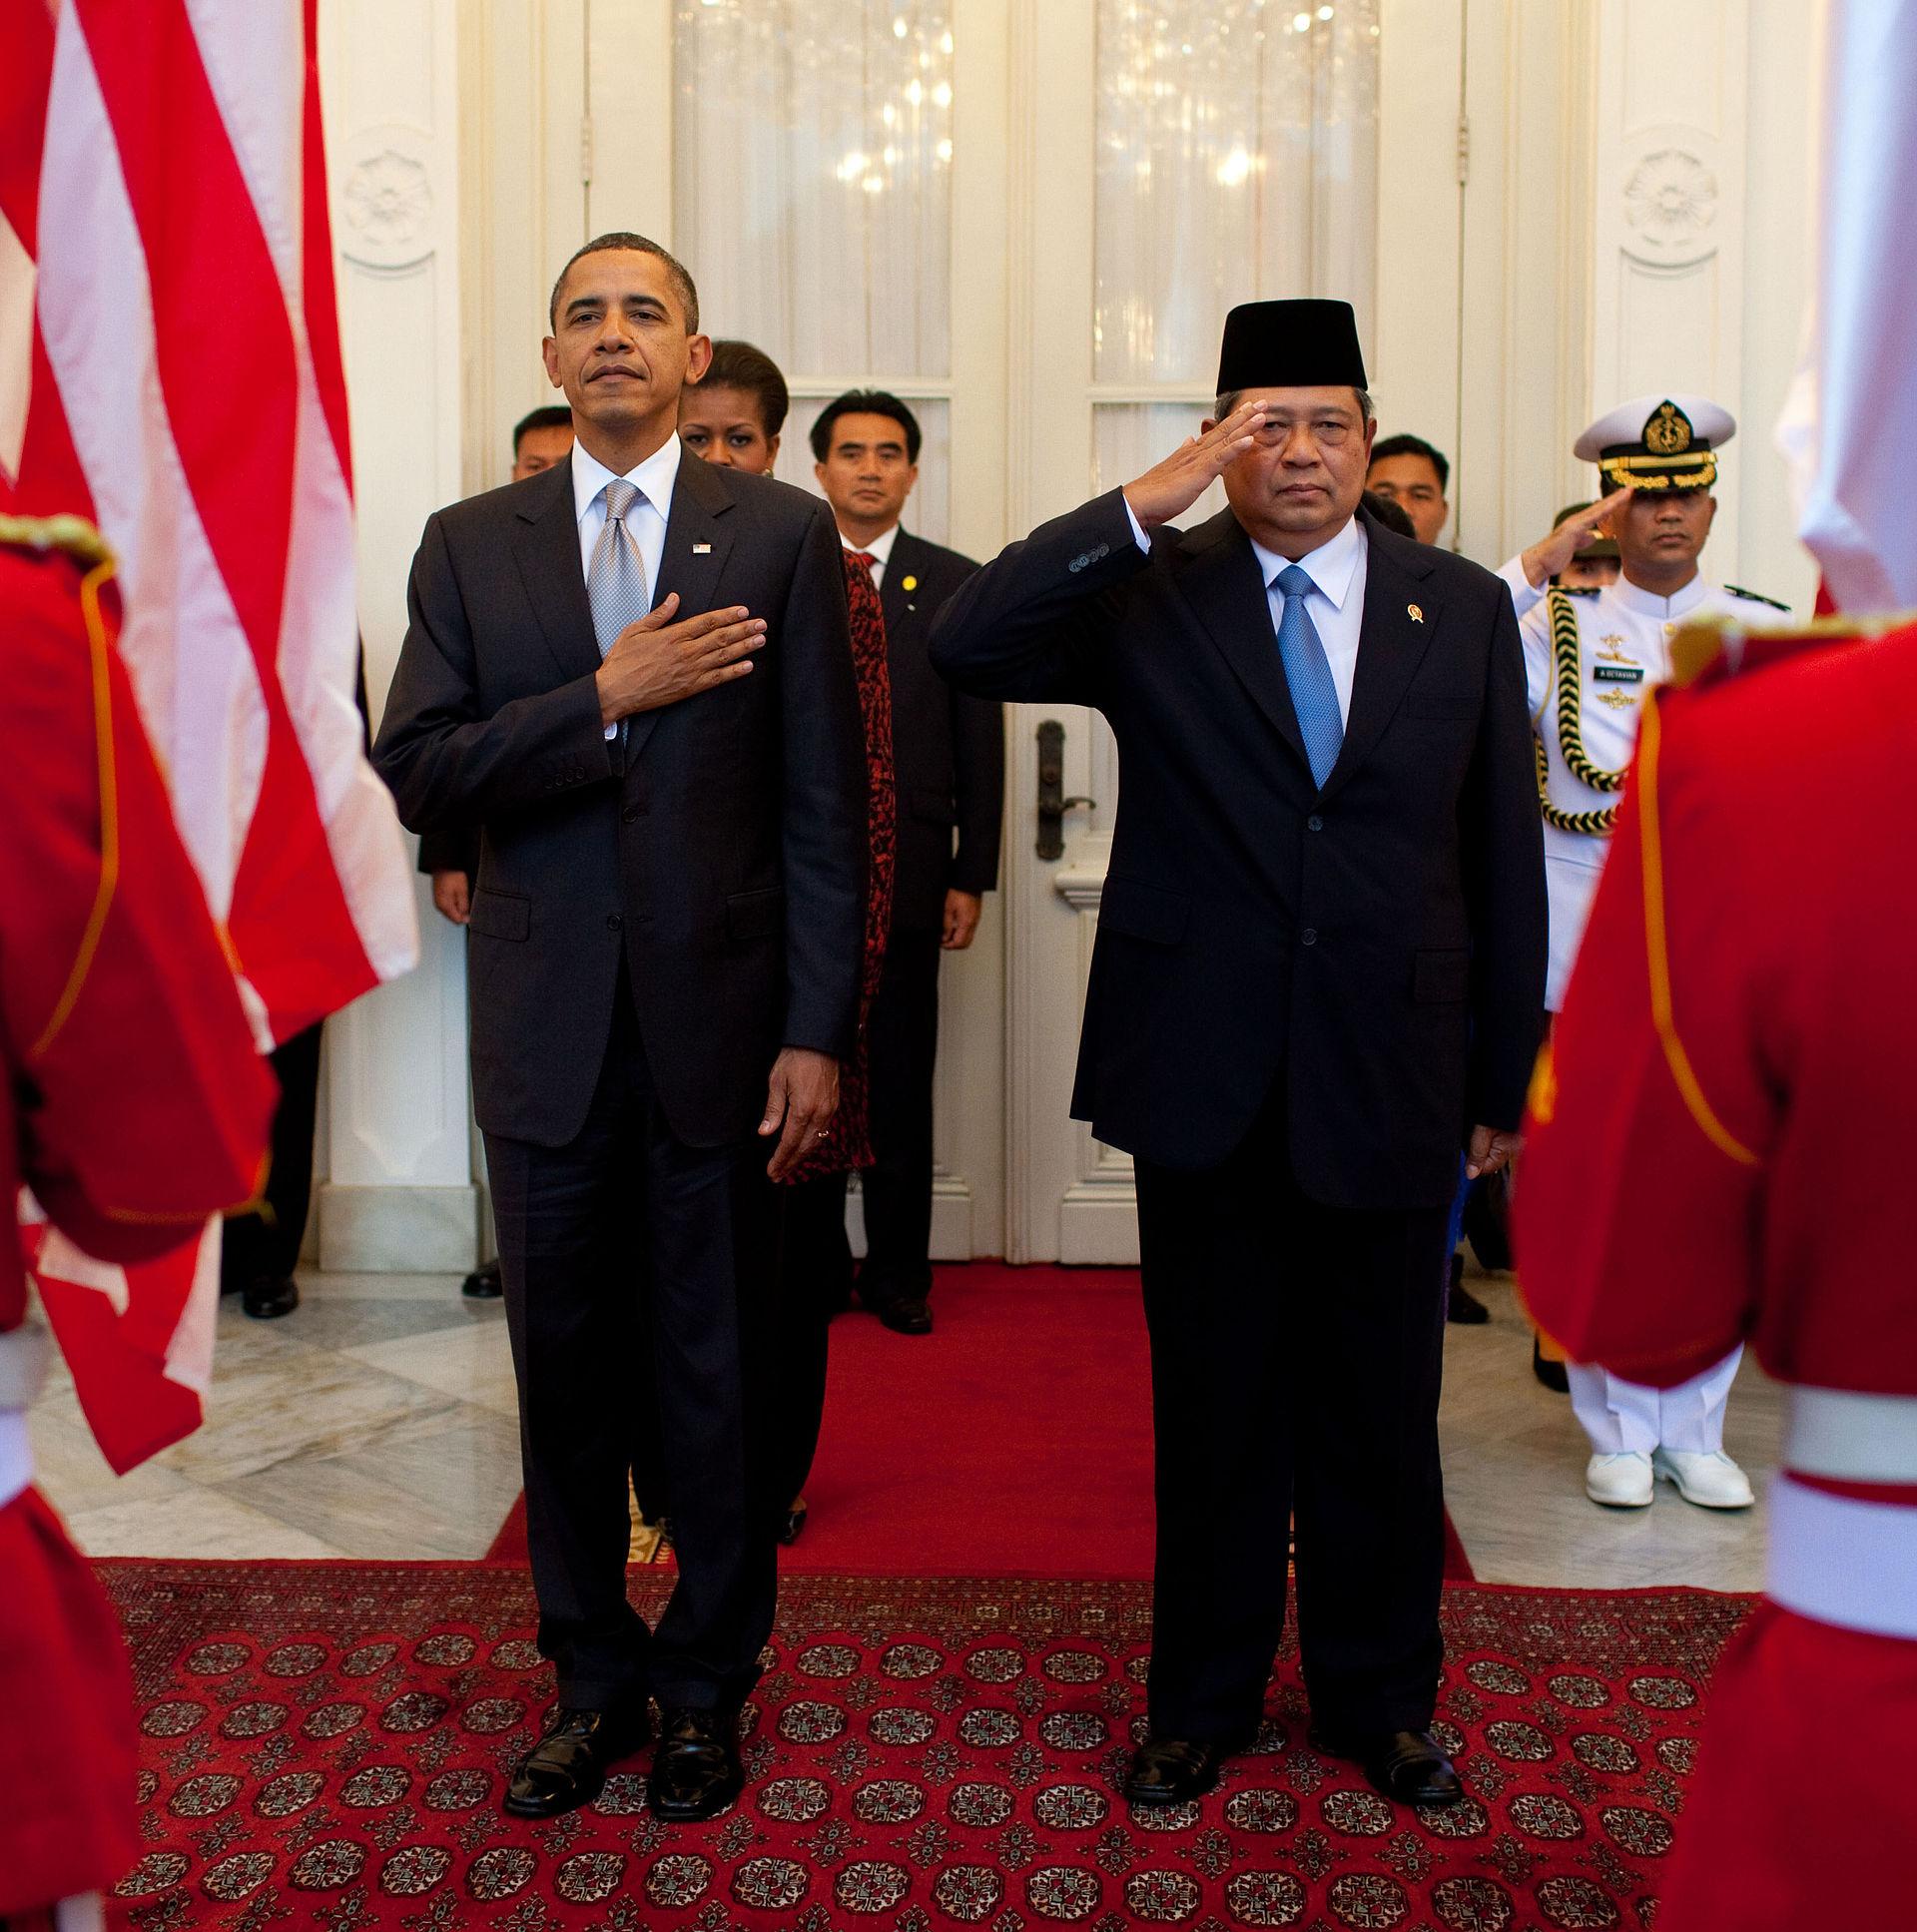 President Obama with Indonesian President Yudhoyono